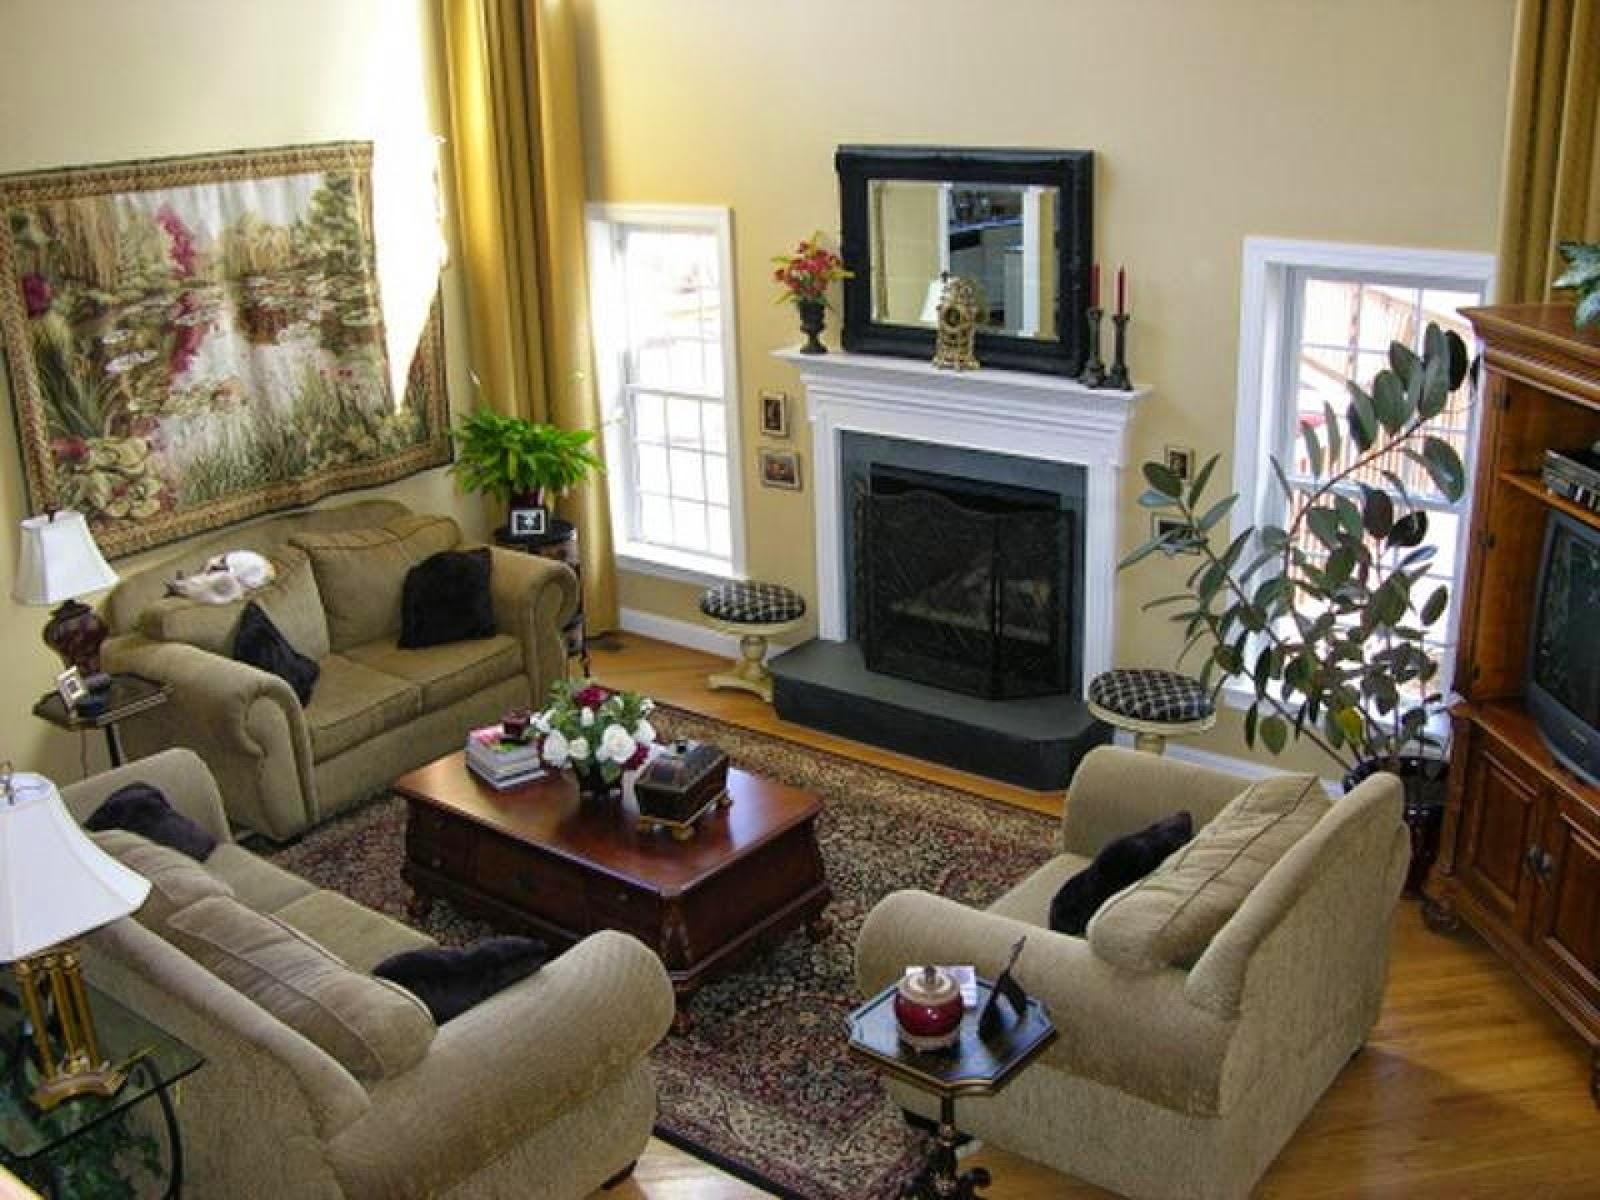 Family Room Decorating Ideas | Home Design Ideas And Inspiration  Onlycily.blogspot.com .